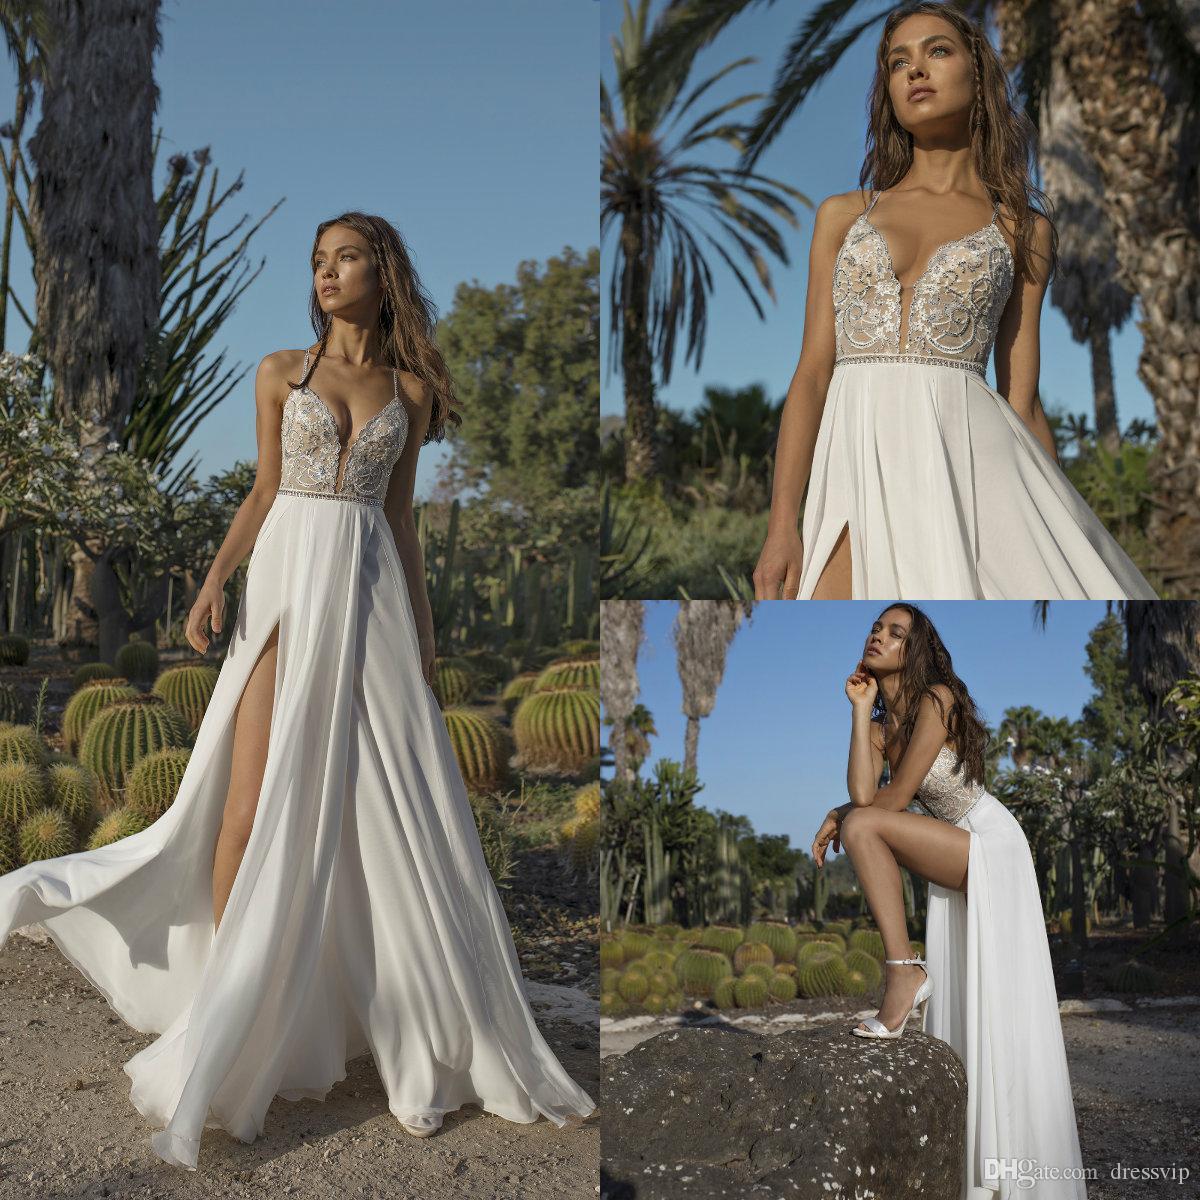 2018 Asaf Dadush Boho Wedding Dresses Applique Sequins Beaded Side Split Beach Wedding Gowns Chiffon Backless Plus Size Bridal Dress